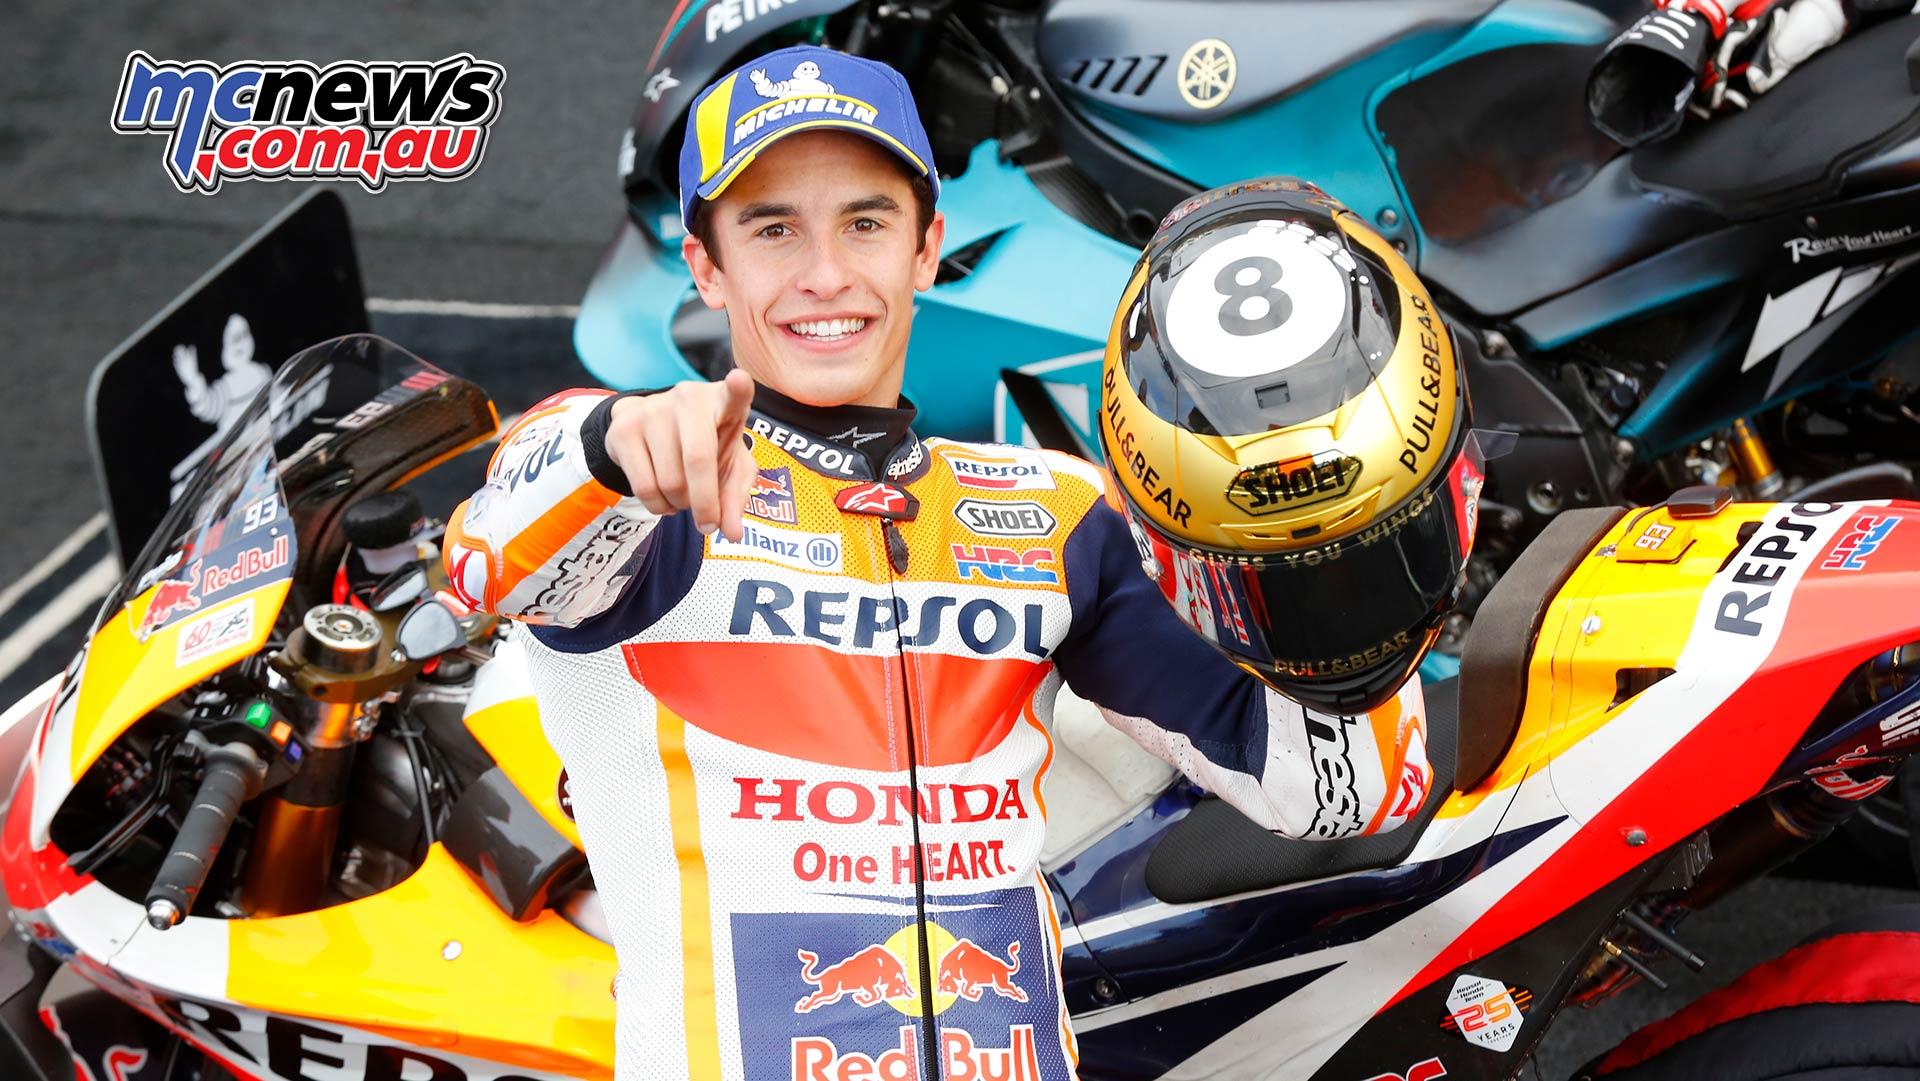 MotoGP Rnd Valencia Race Marquez Helmet